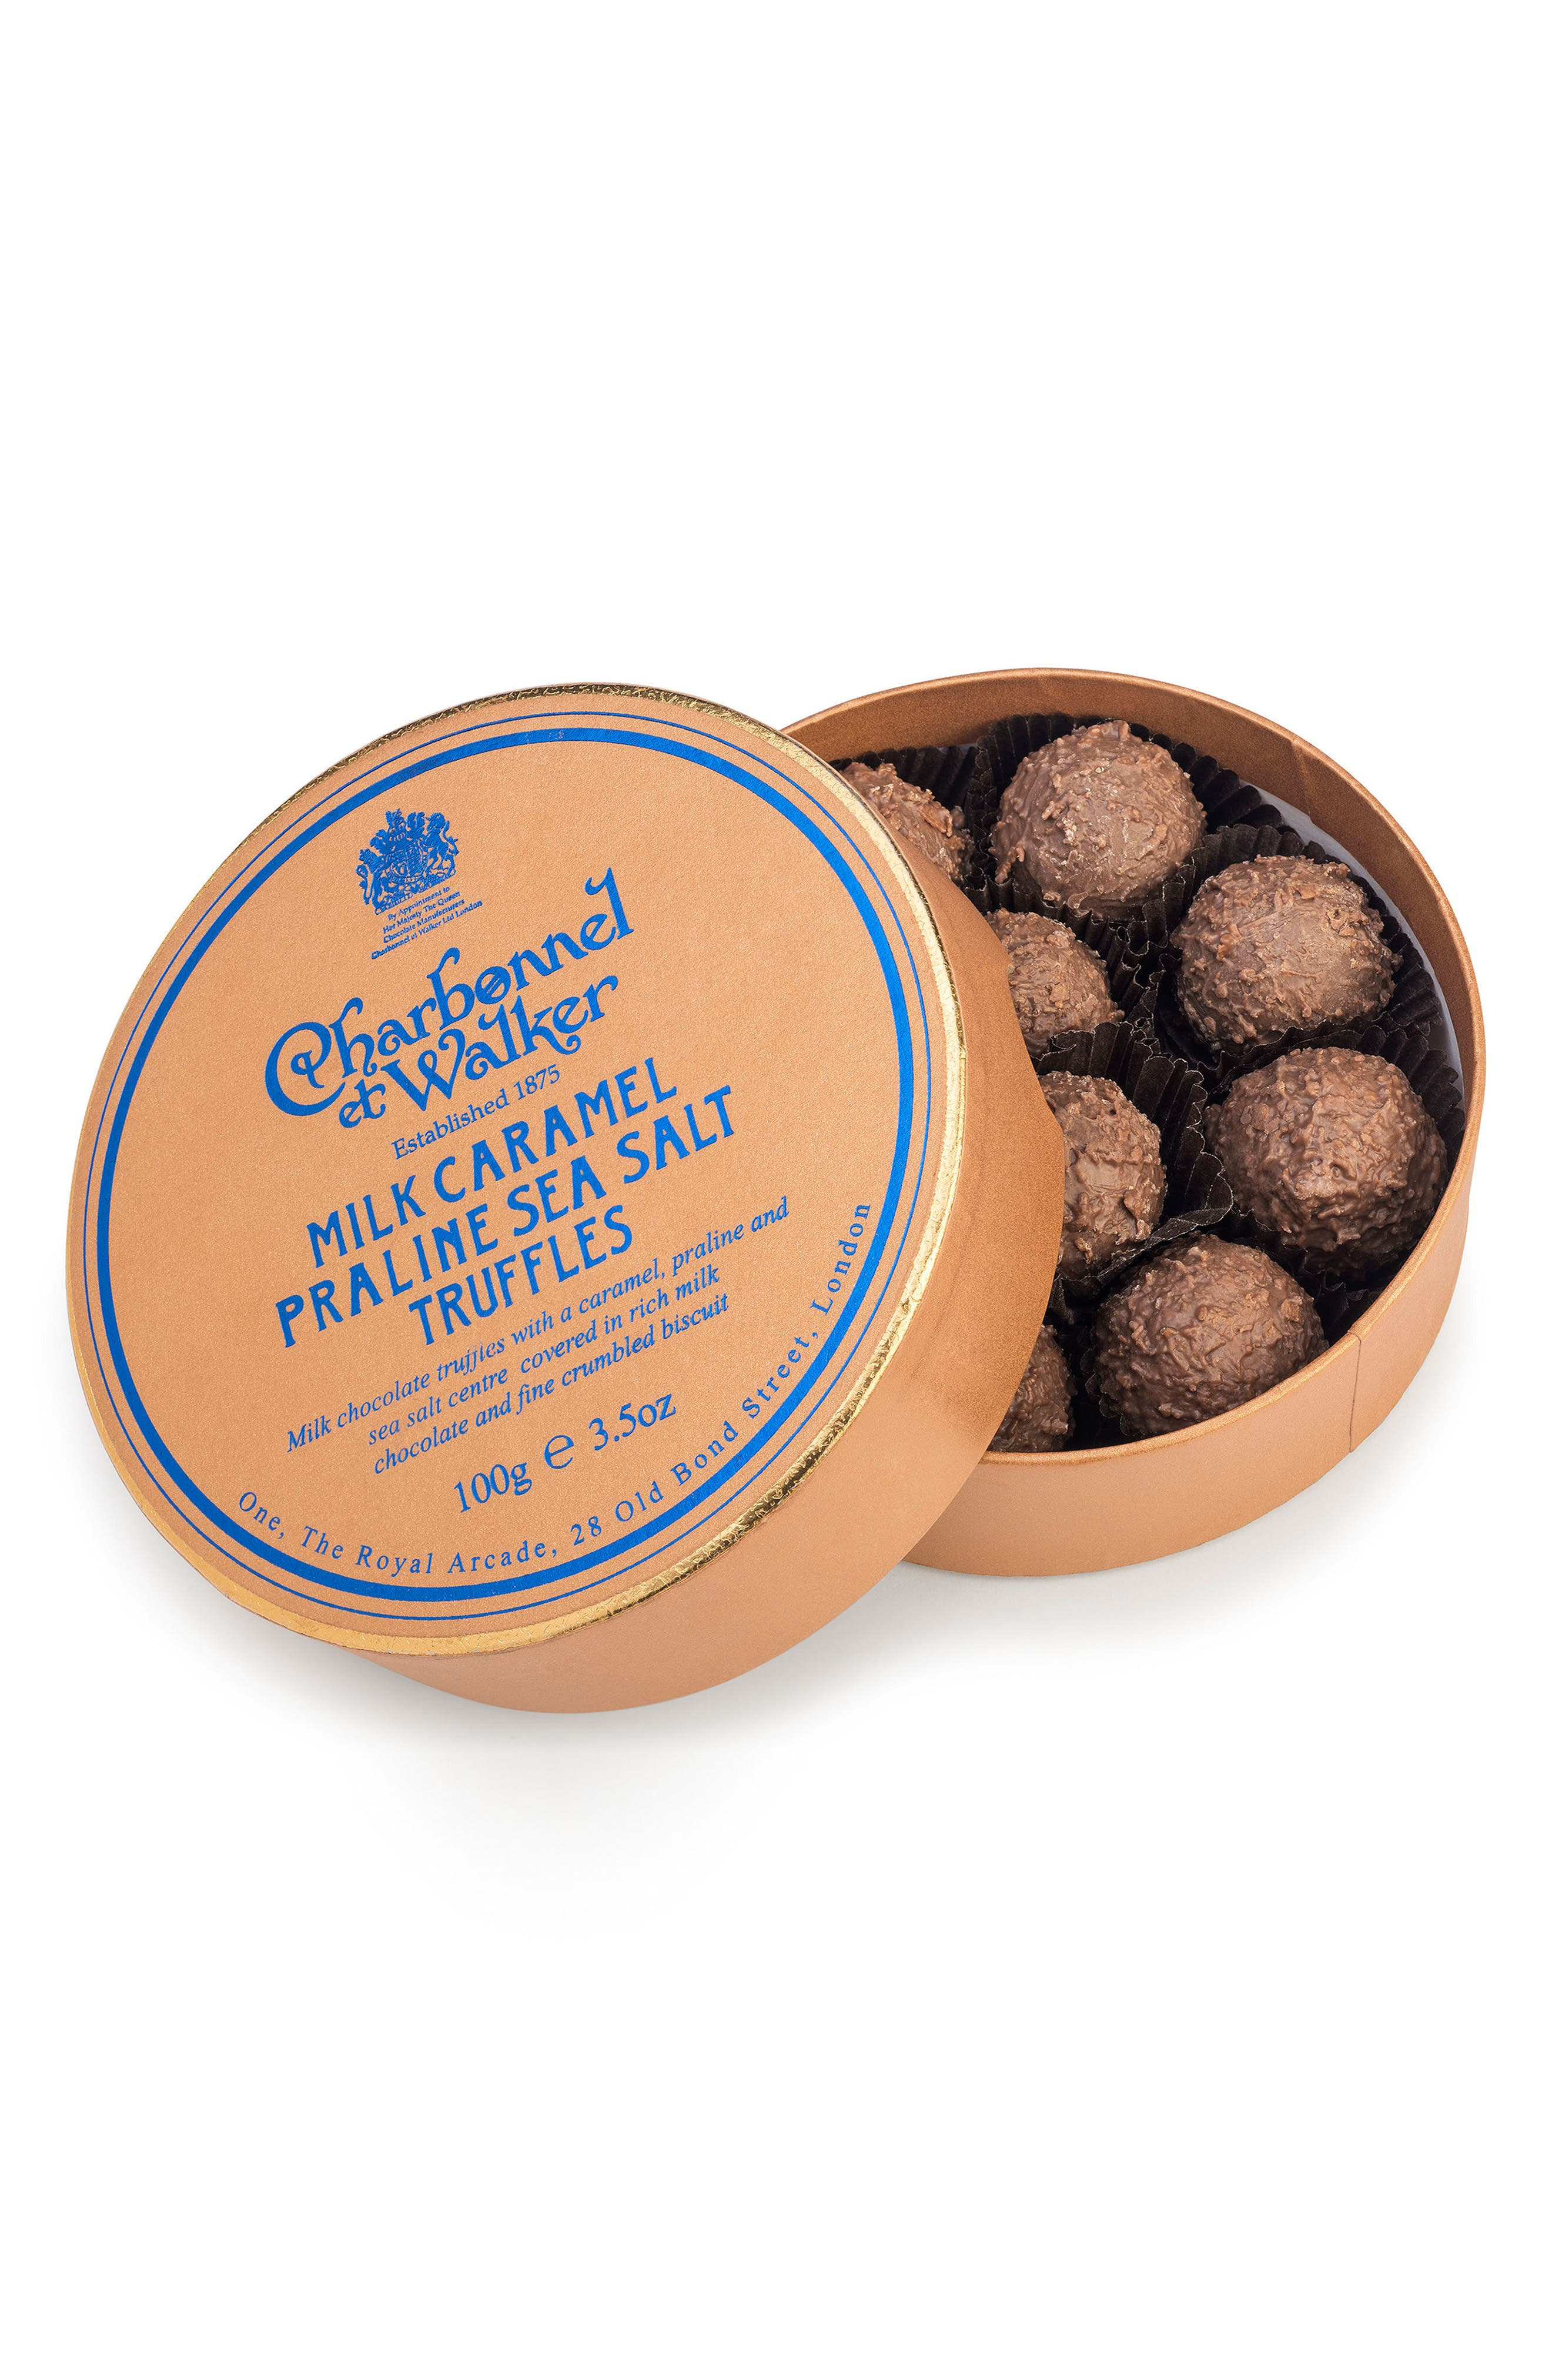 Flavored Chocolate Truffles in Gift Box,                         Main,                         color, Sea Salt/ Praline Caramel